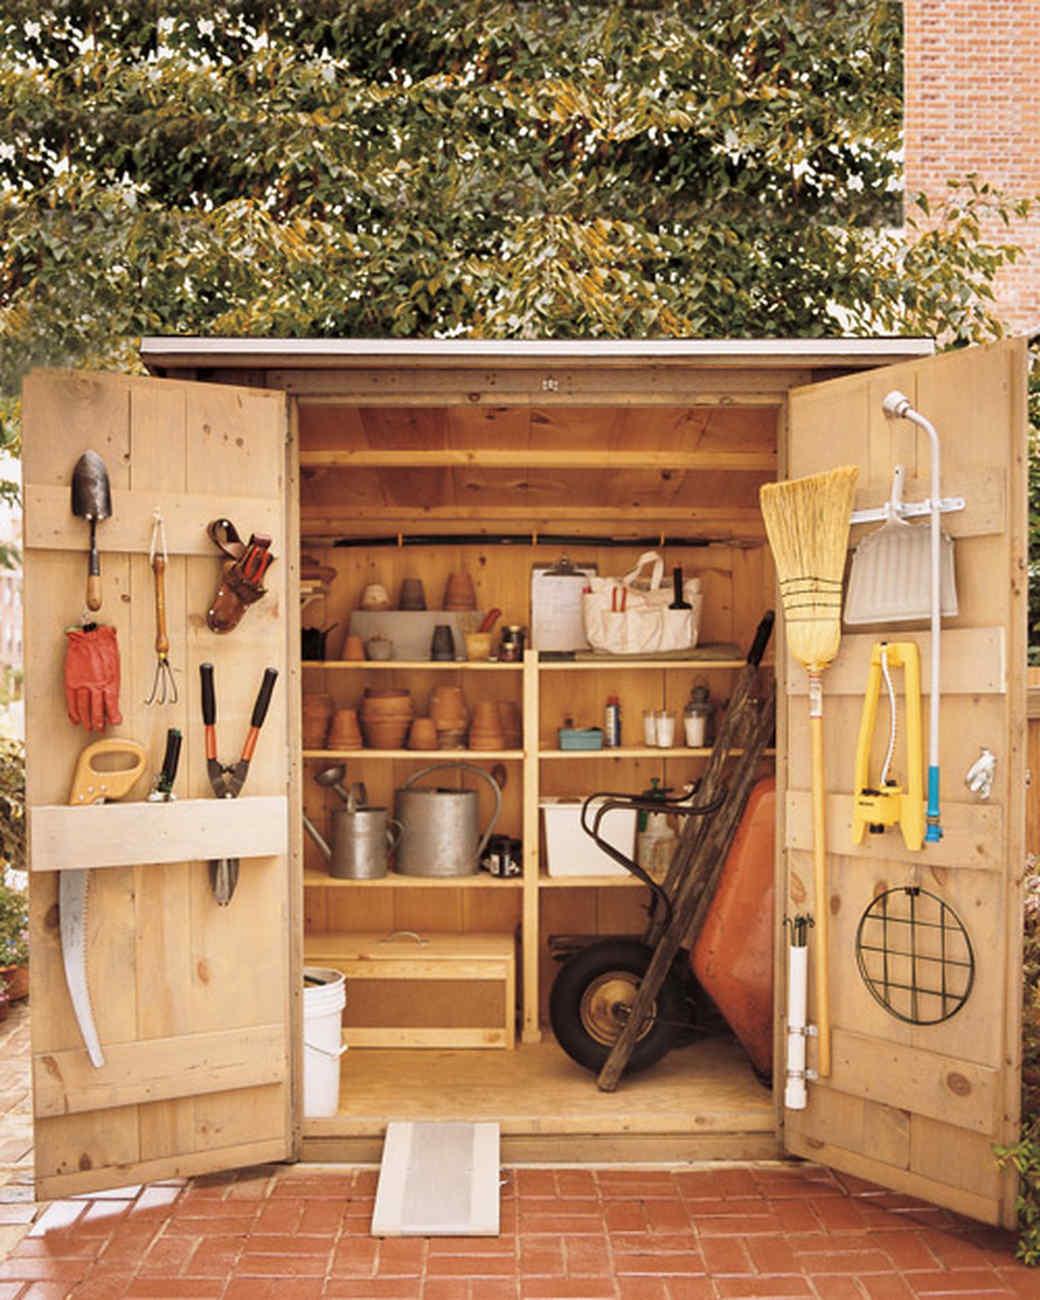 ml_0304_garden_shed.jpg